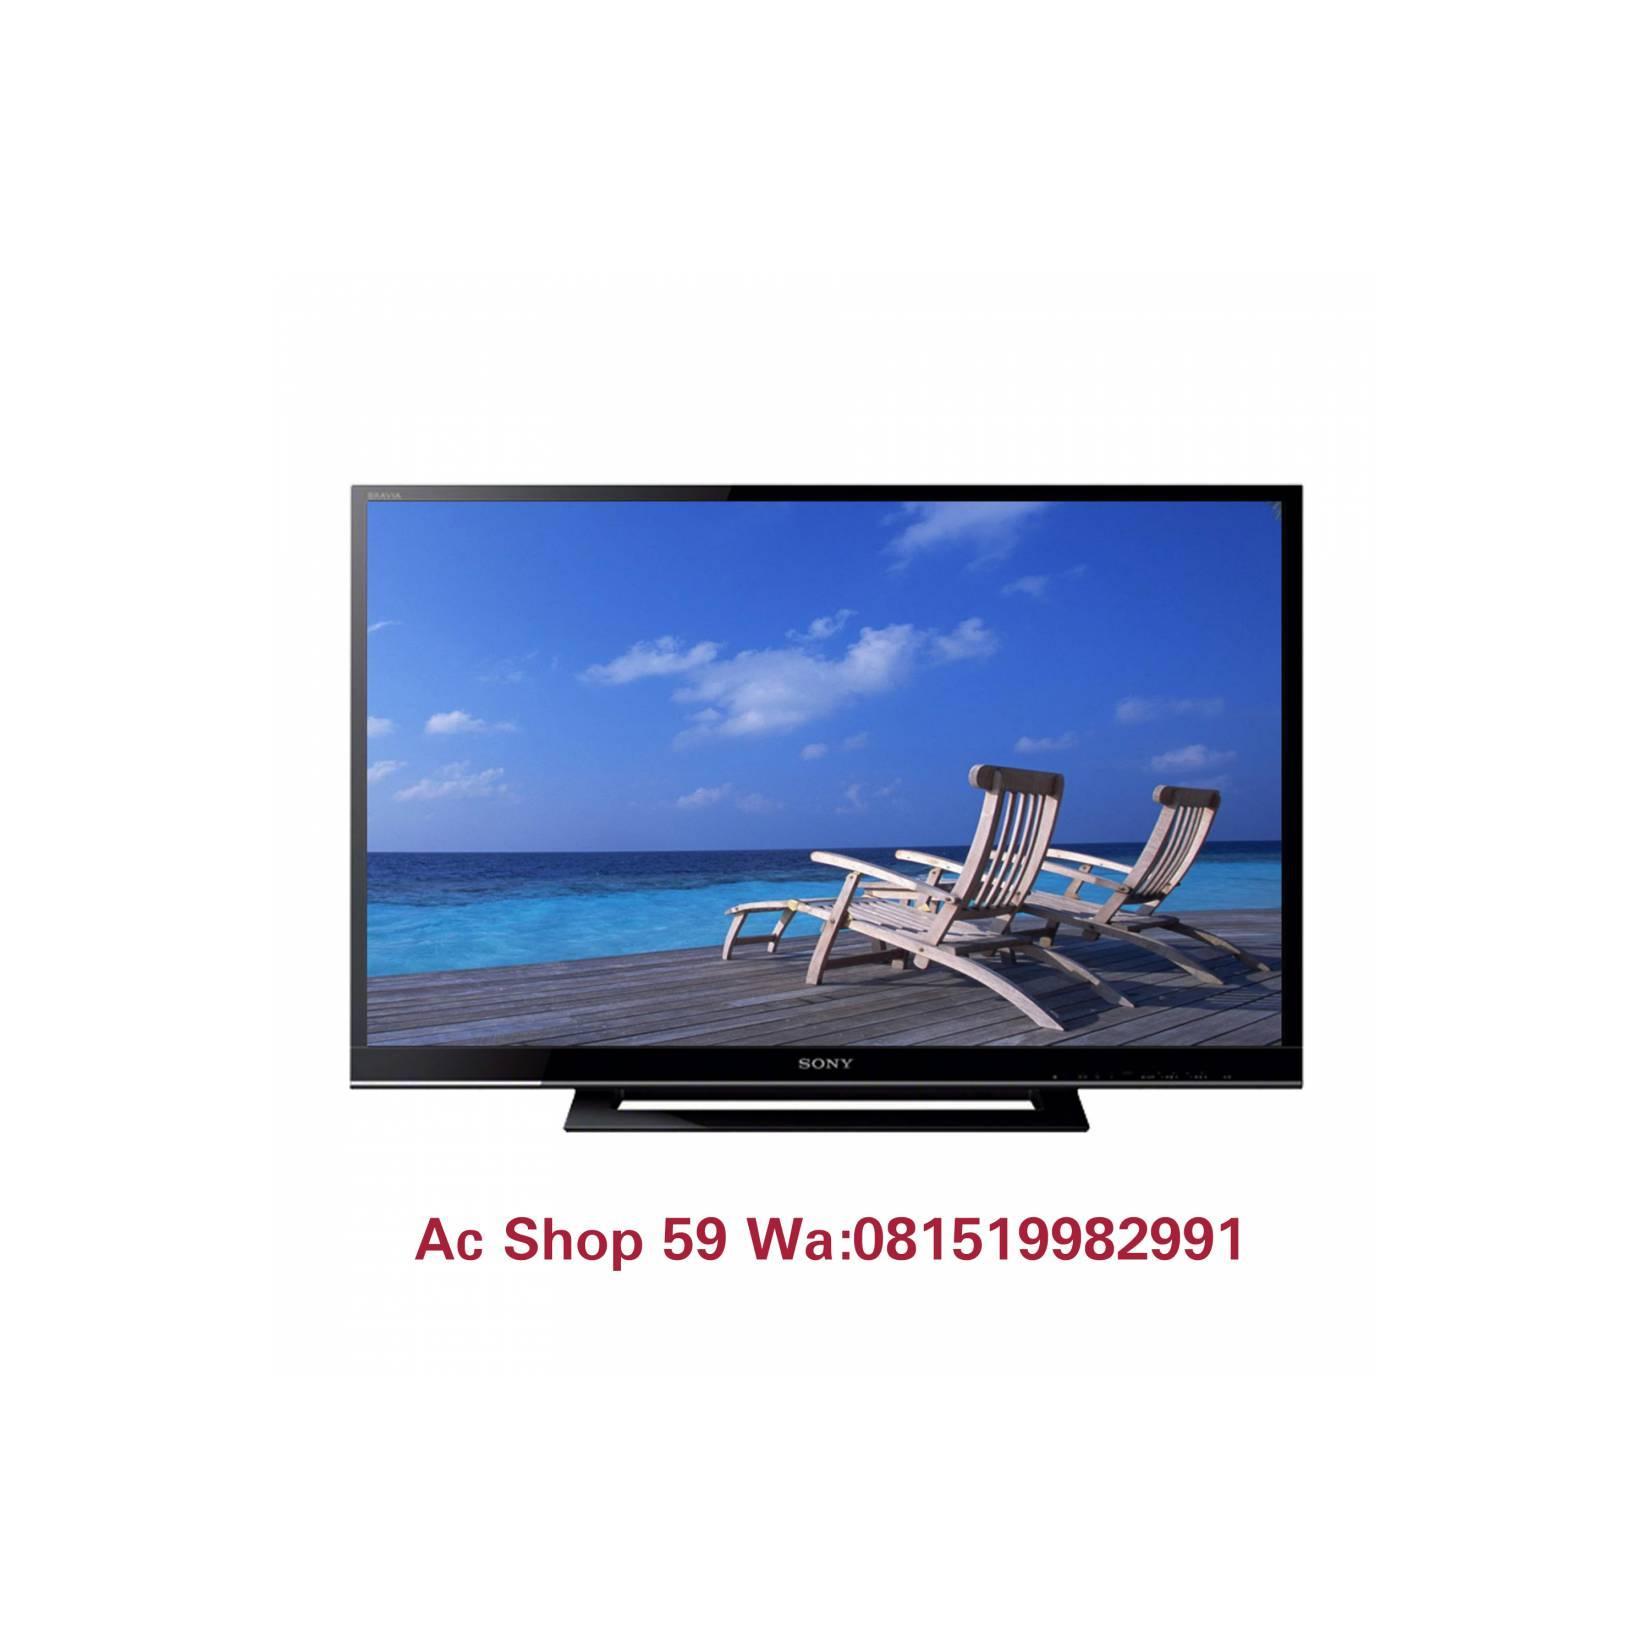 LED TV SONY KLV-32R302C CLEAR RESOLUTION ENHANCER NEW